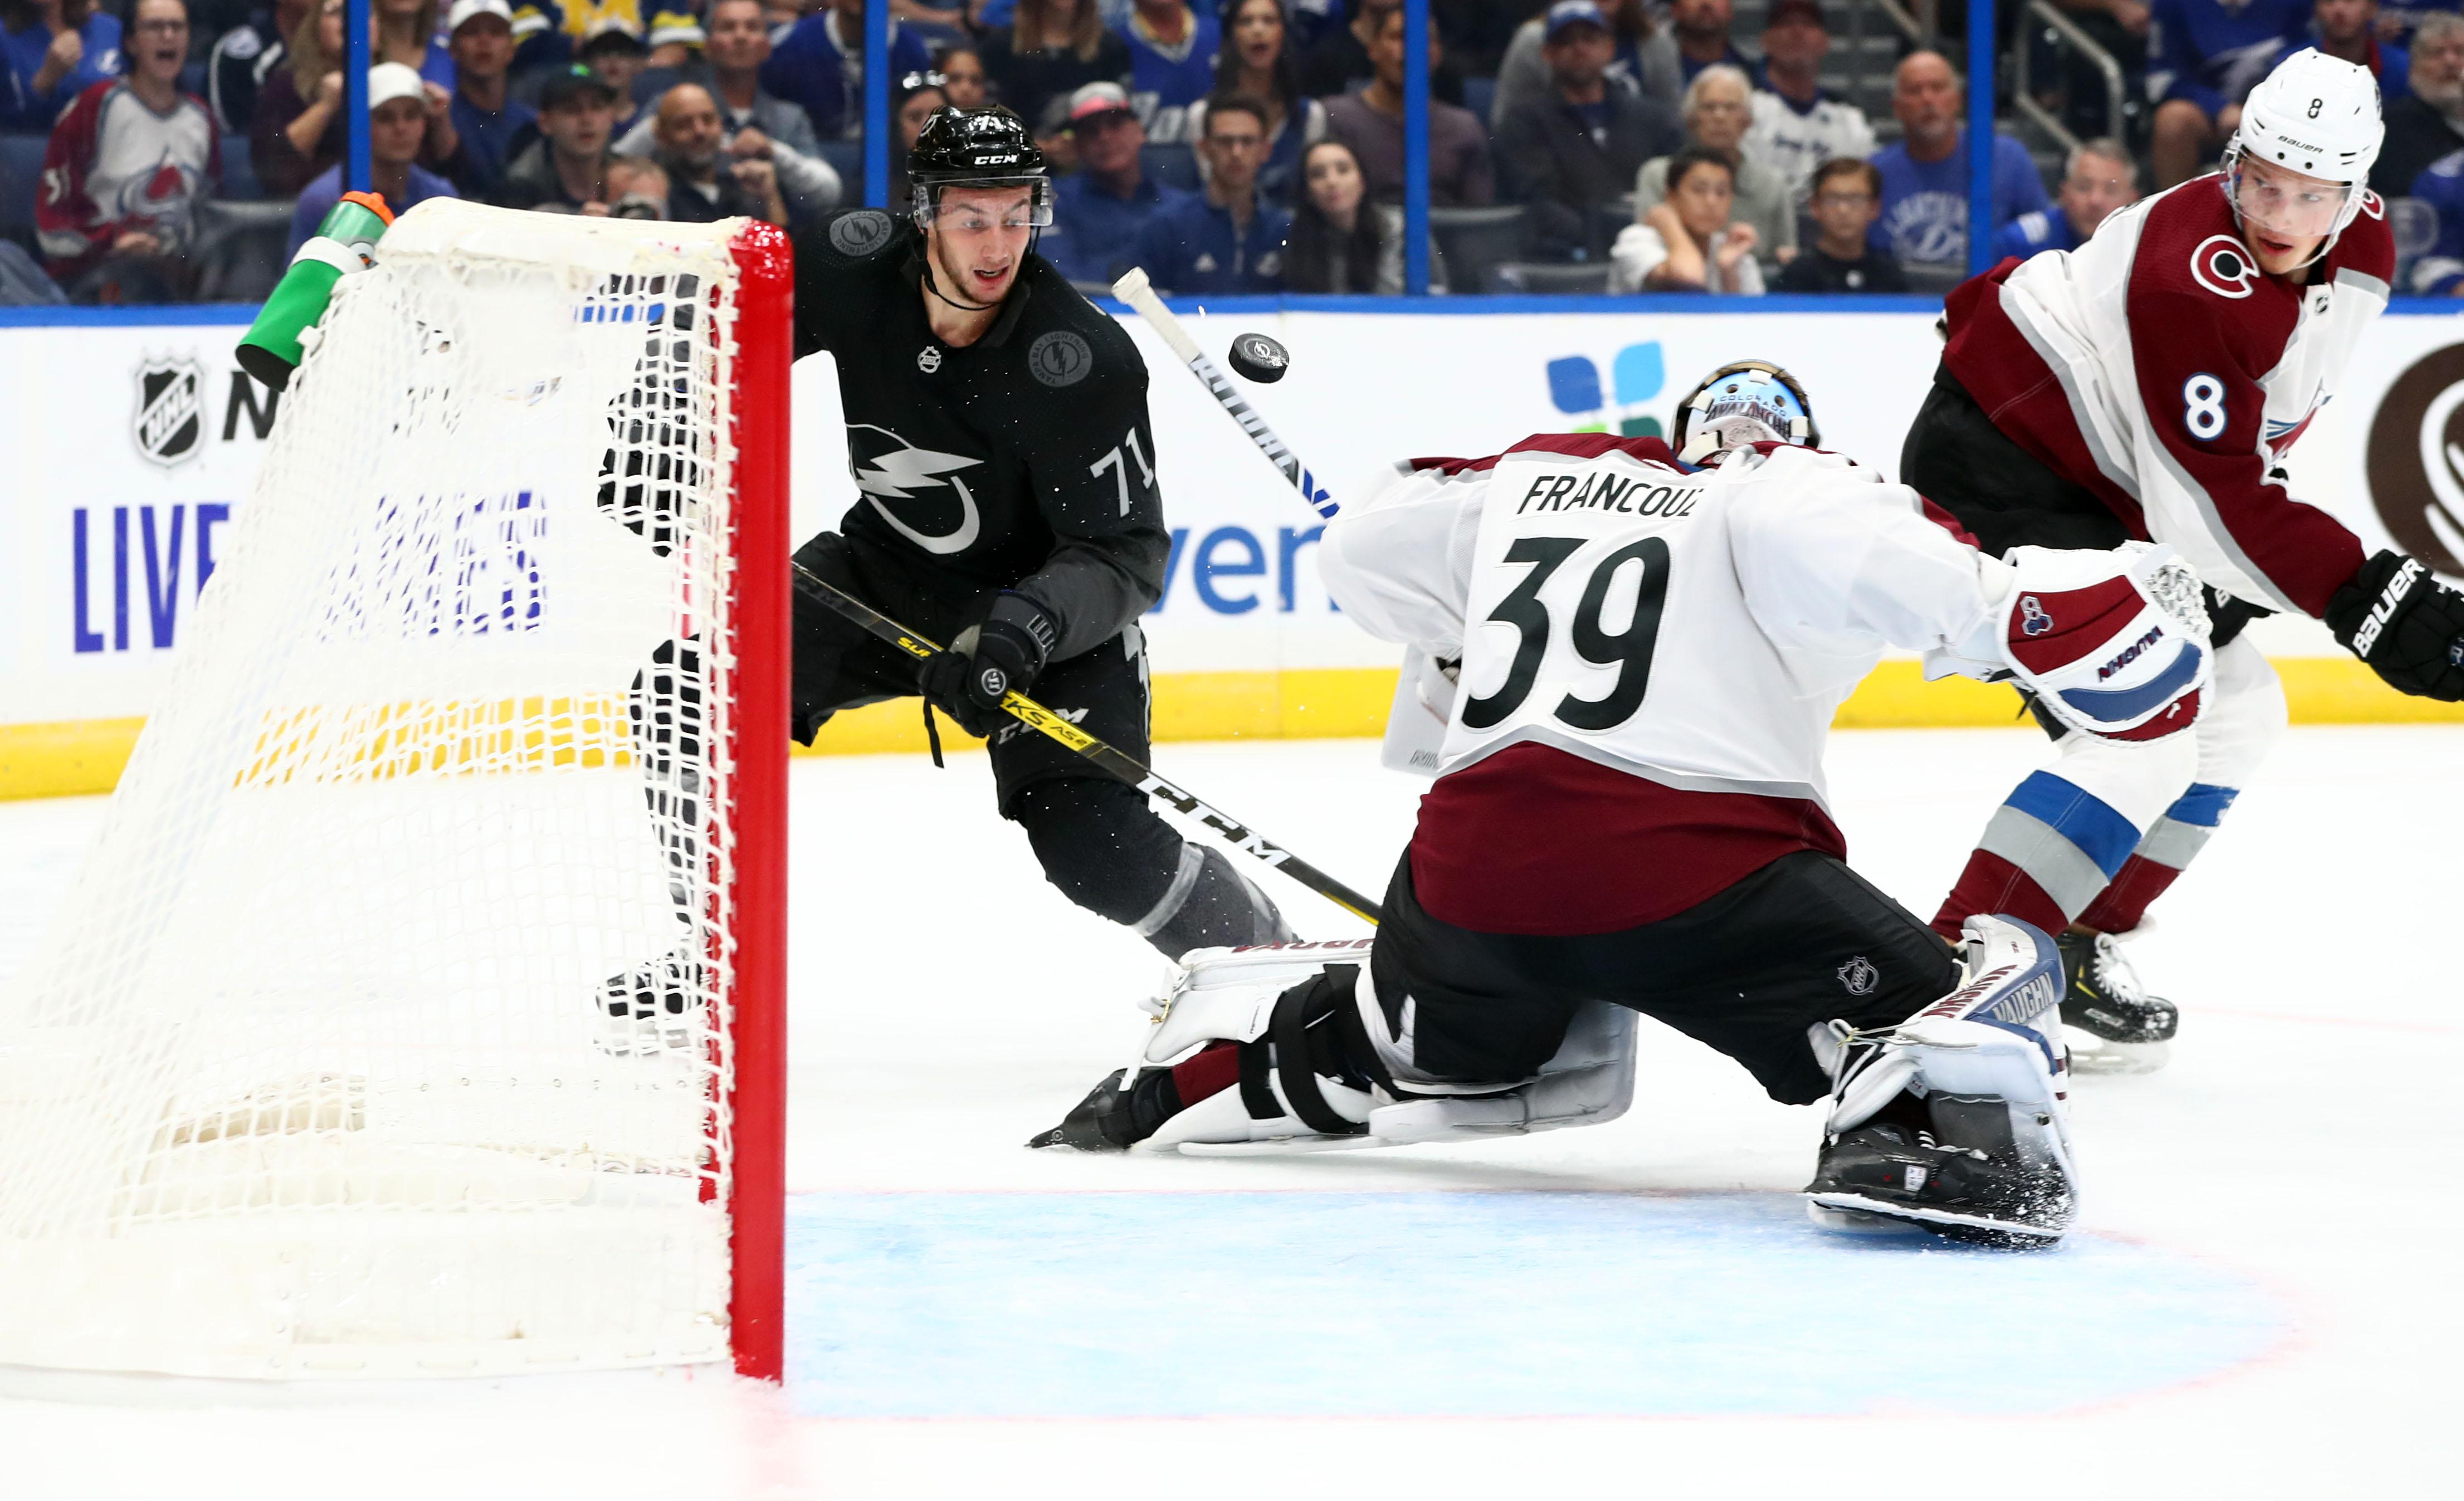 NHL: Colorado Avalanche at Tampa Bay Lightning